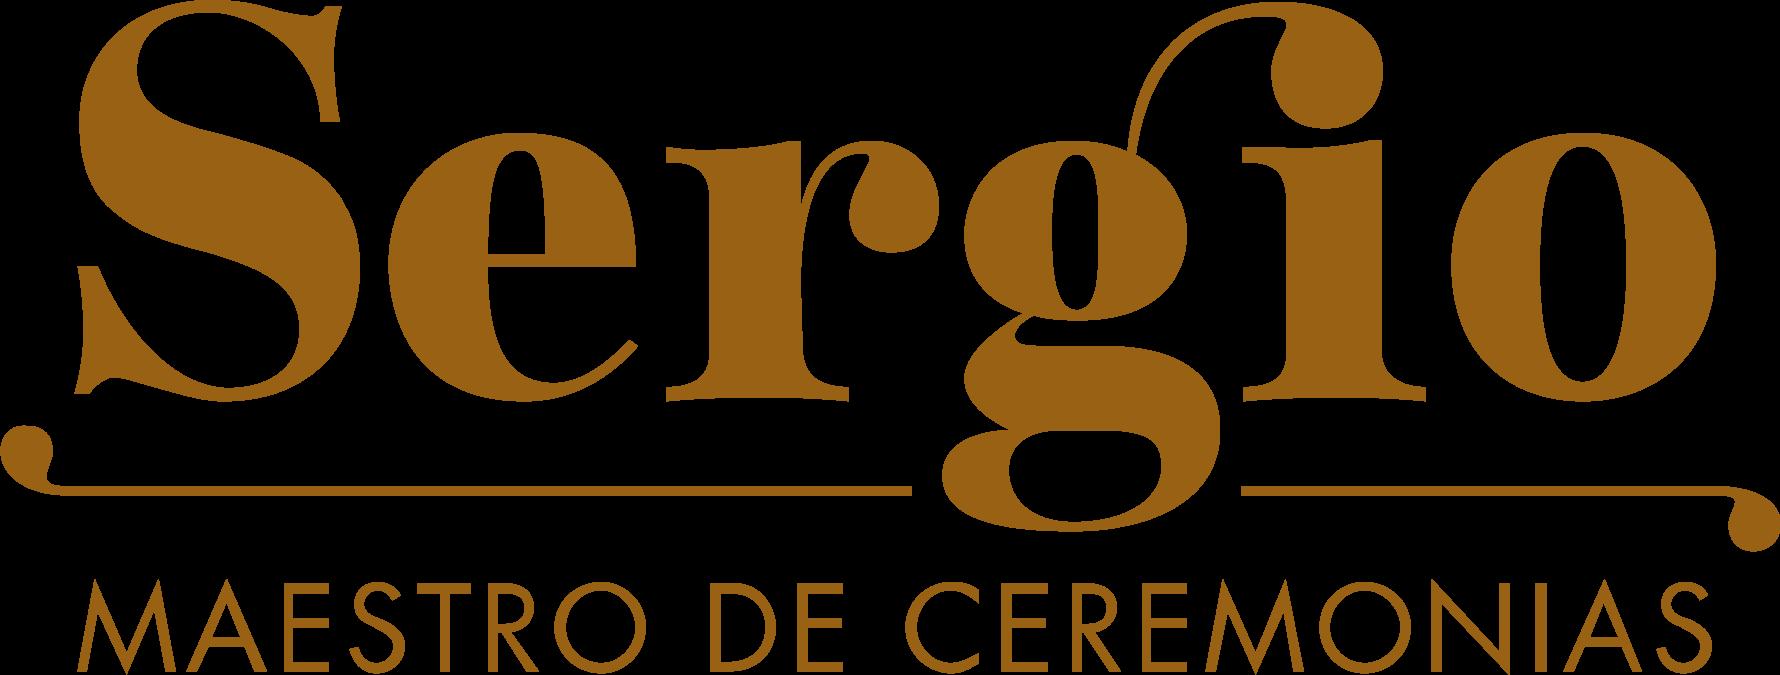 Sergio | Maestro de Ceremonias